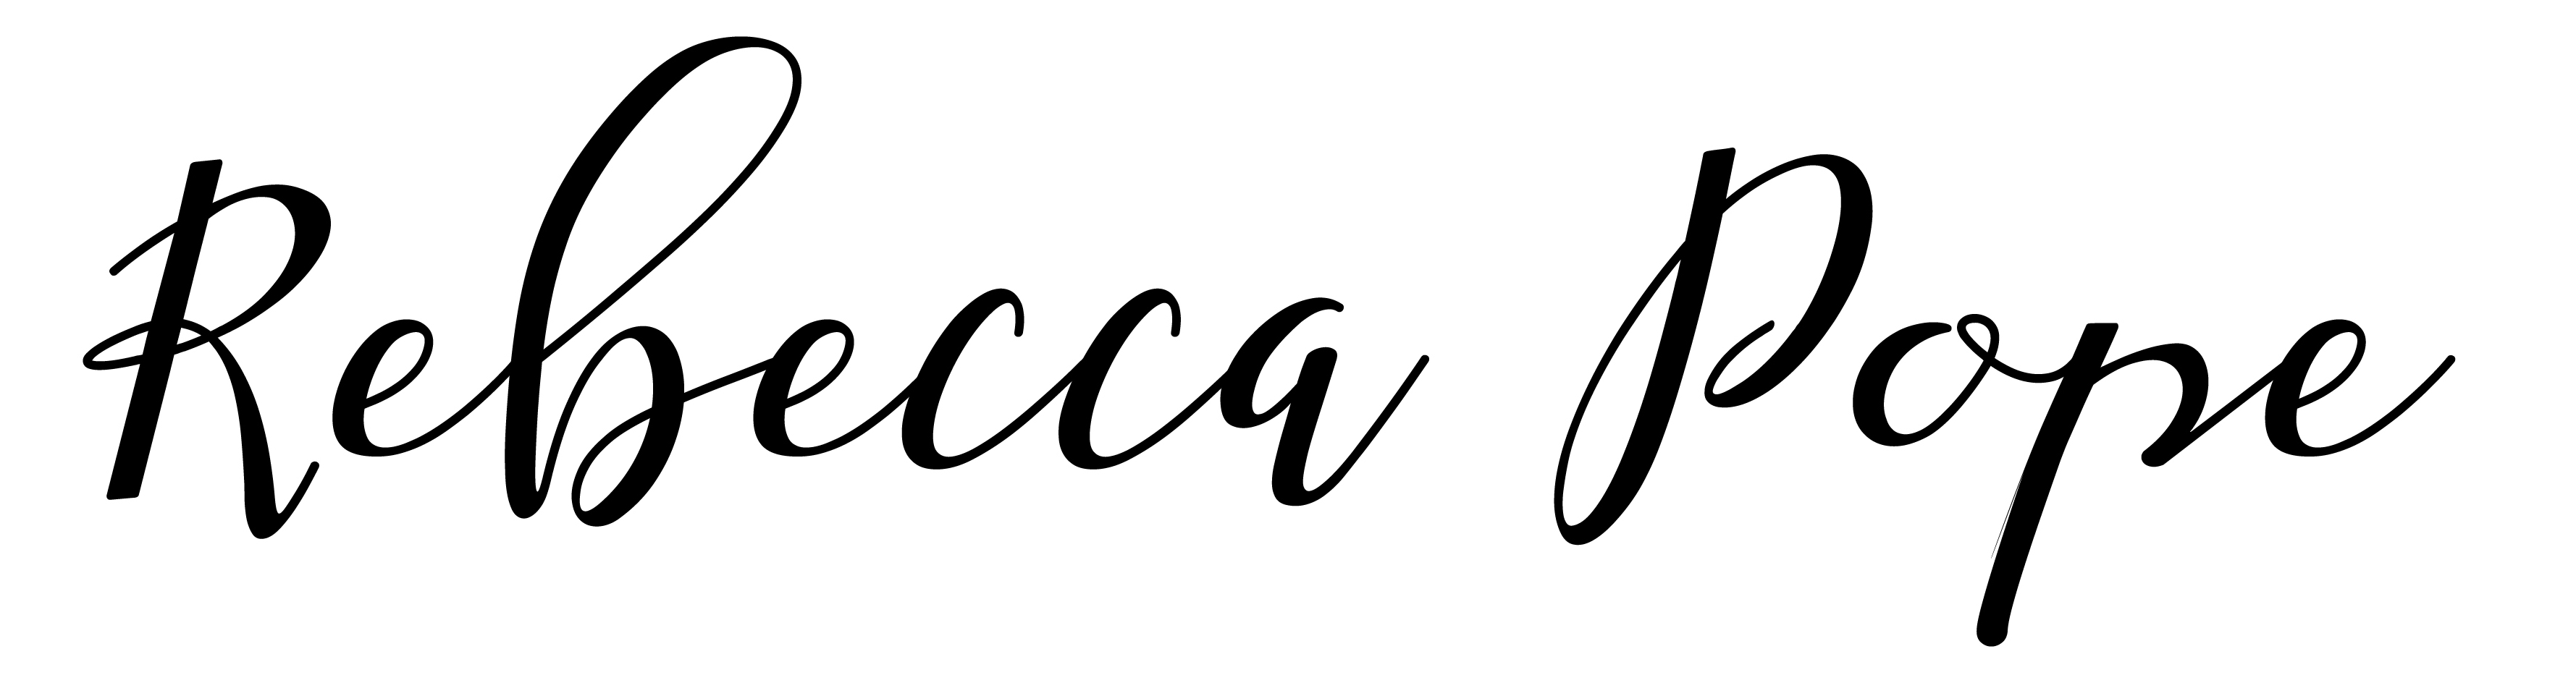 Rebecca Pope Sydney Lifestyle Blogger